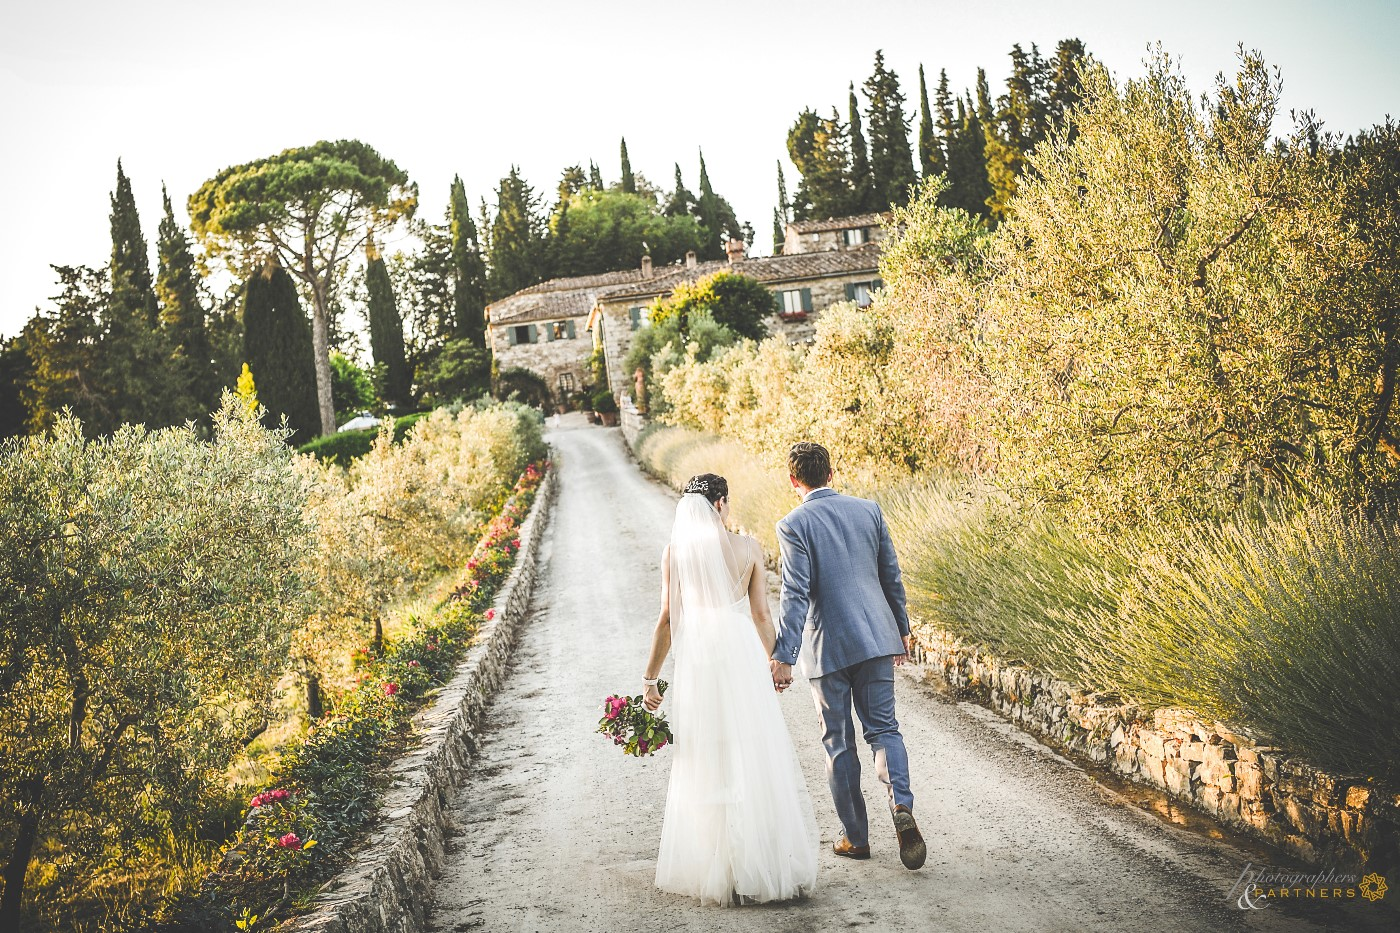 photographers_weddings_italy_15.jpg